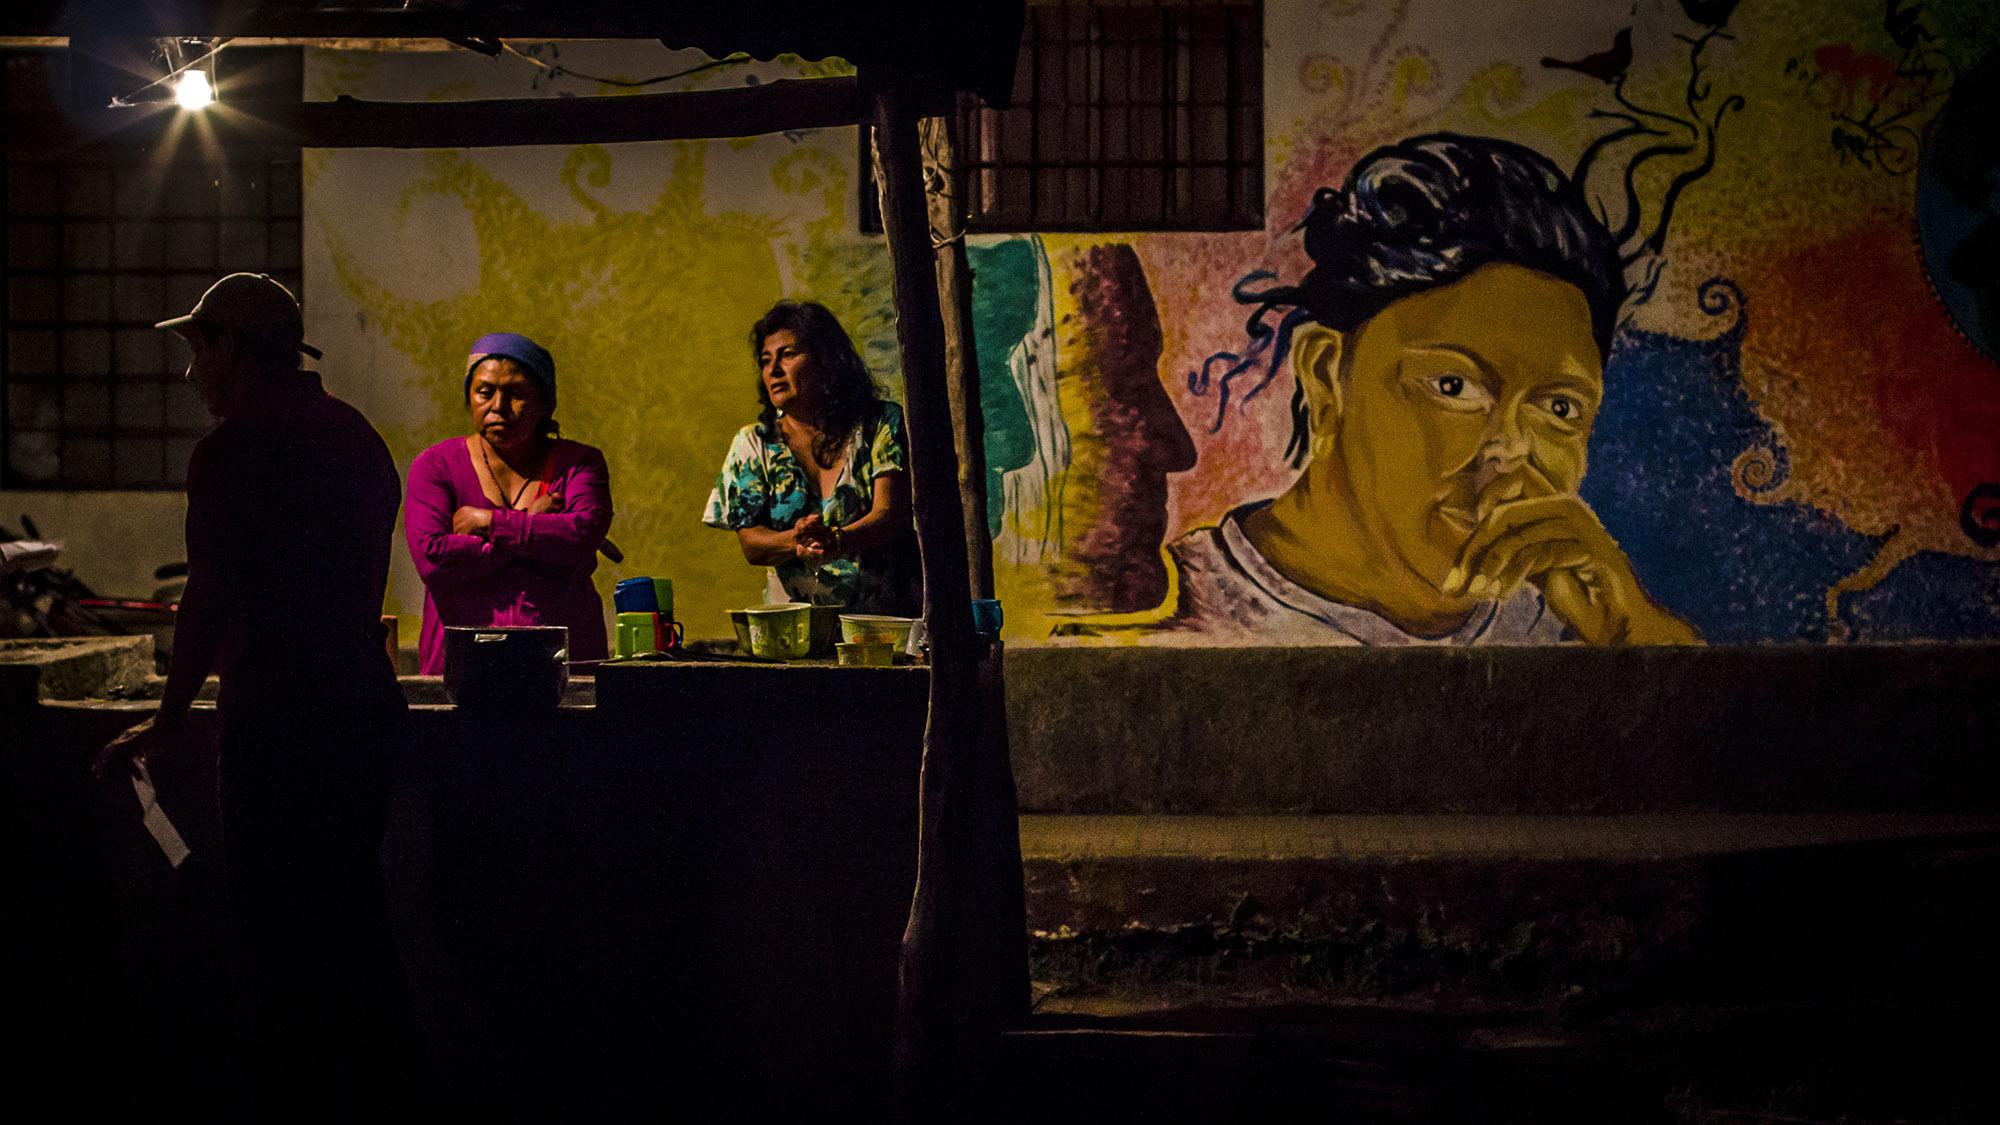 Berta Cáceres hecha pinta, pancarta, memoria